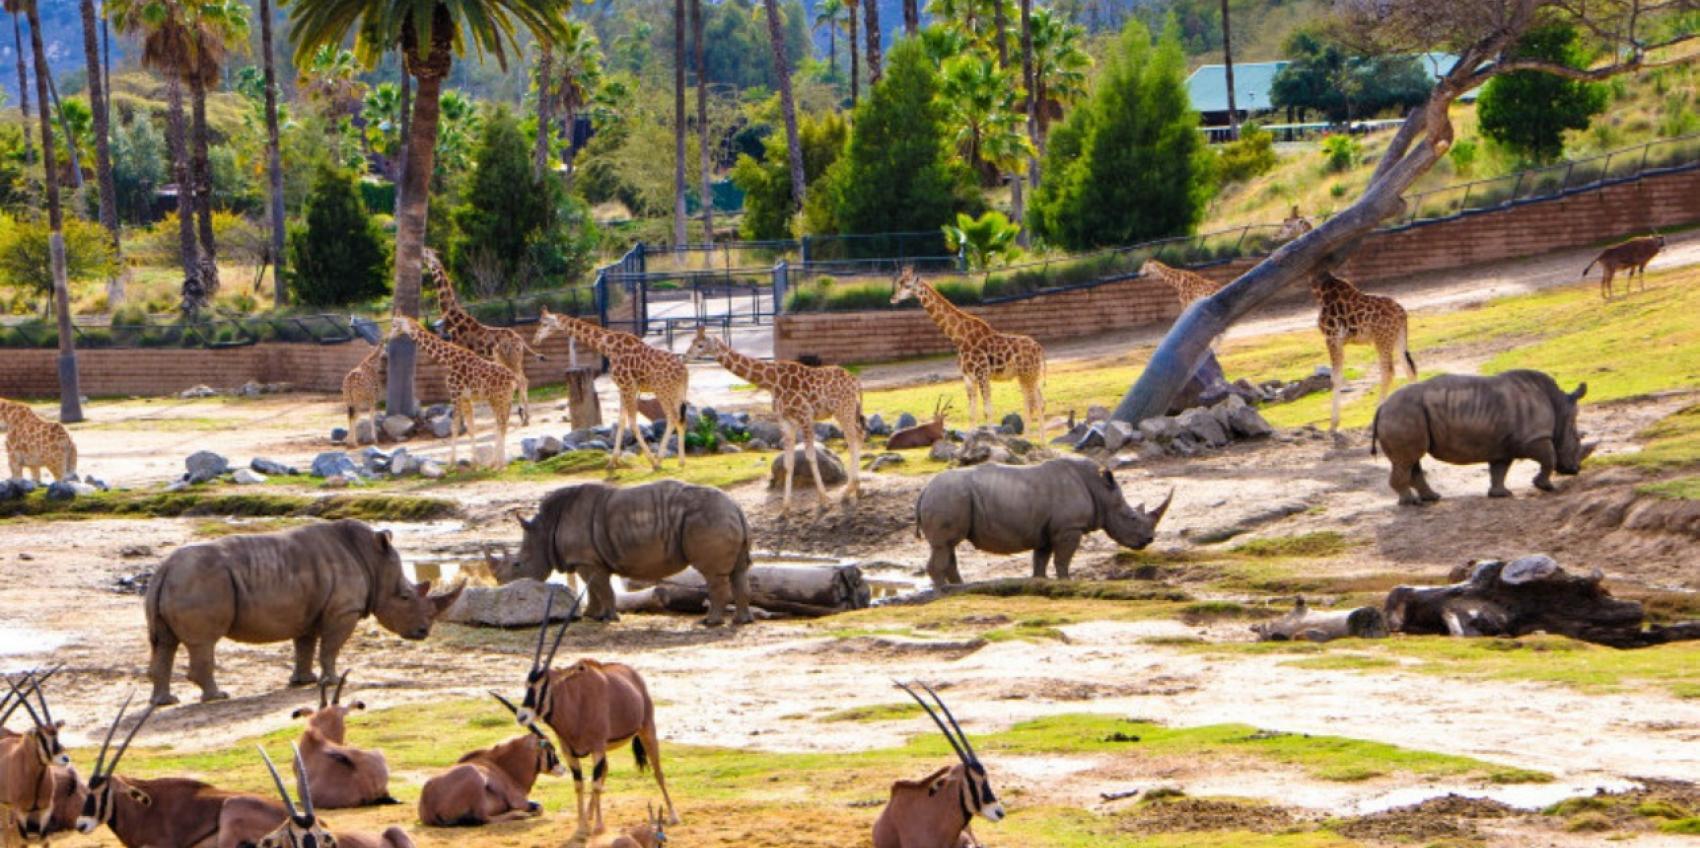 San Diego Zoo Safari Park American Public Gardens Association